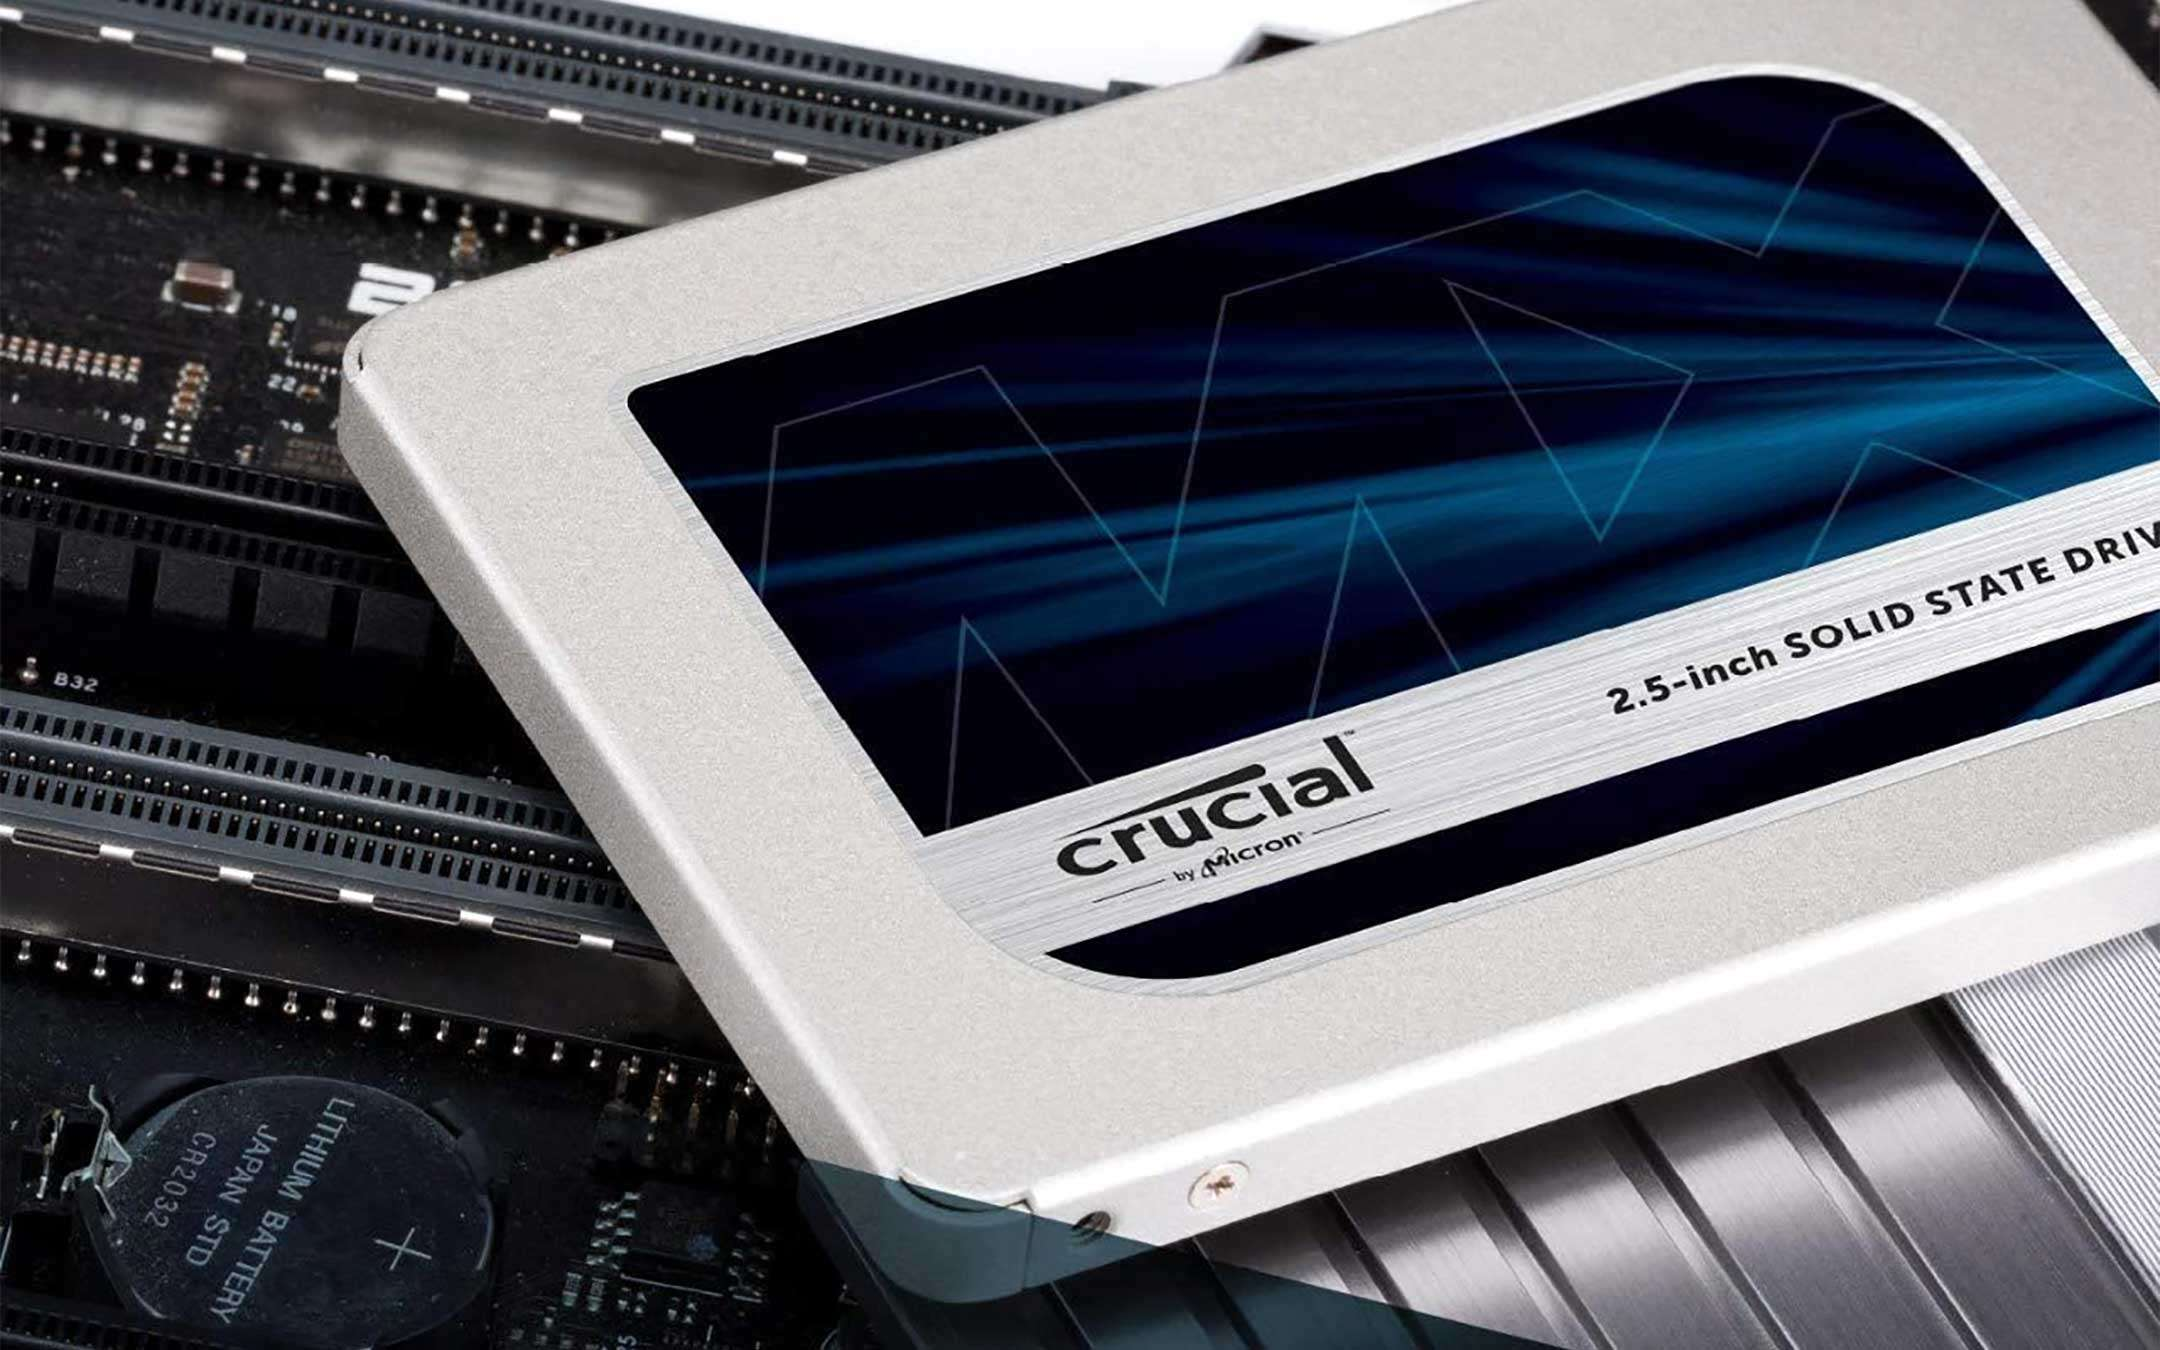 Crucial MX500, SSD